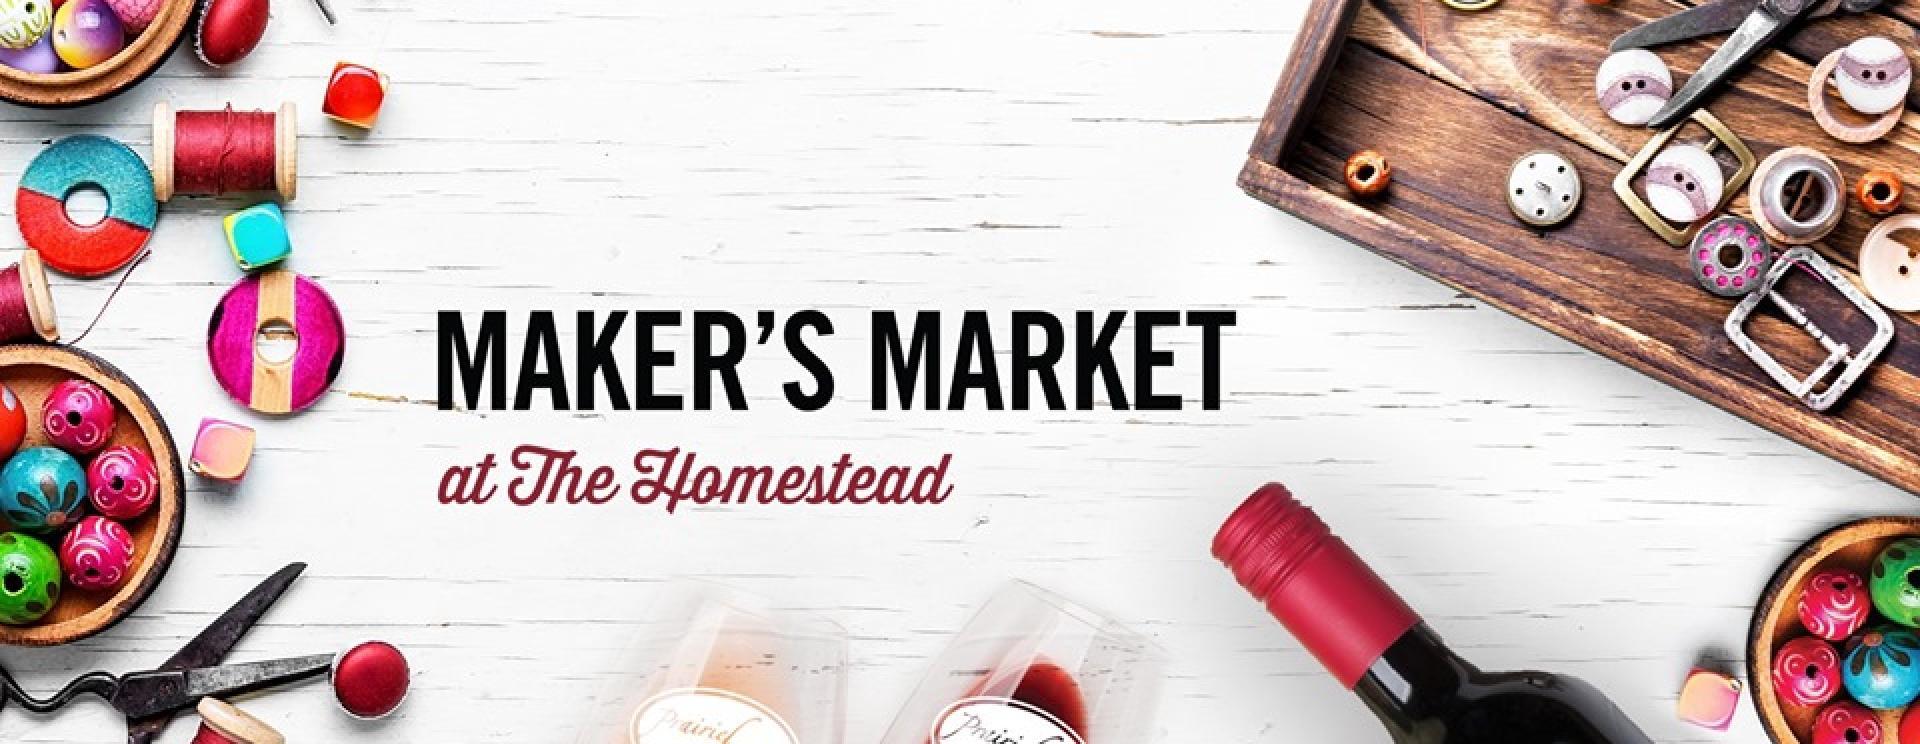 Maker's Market